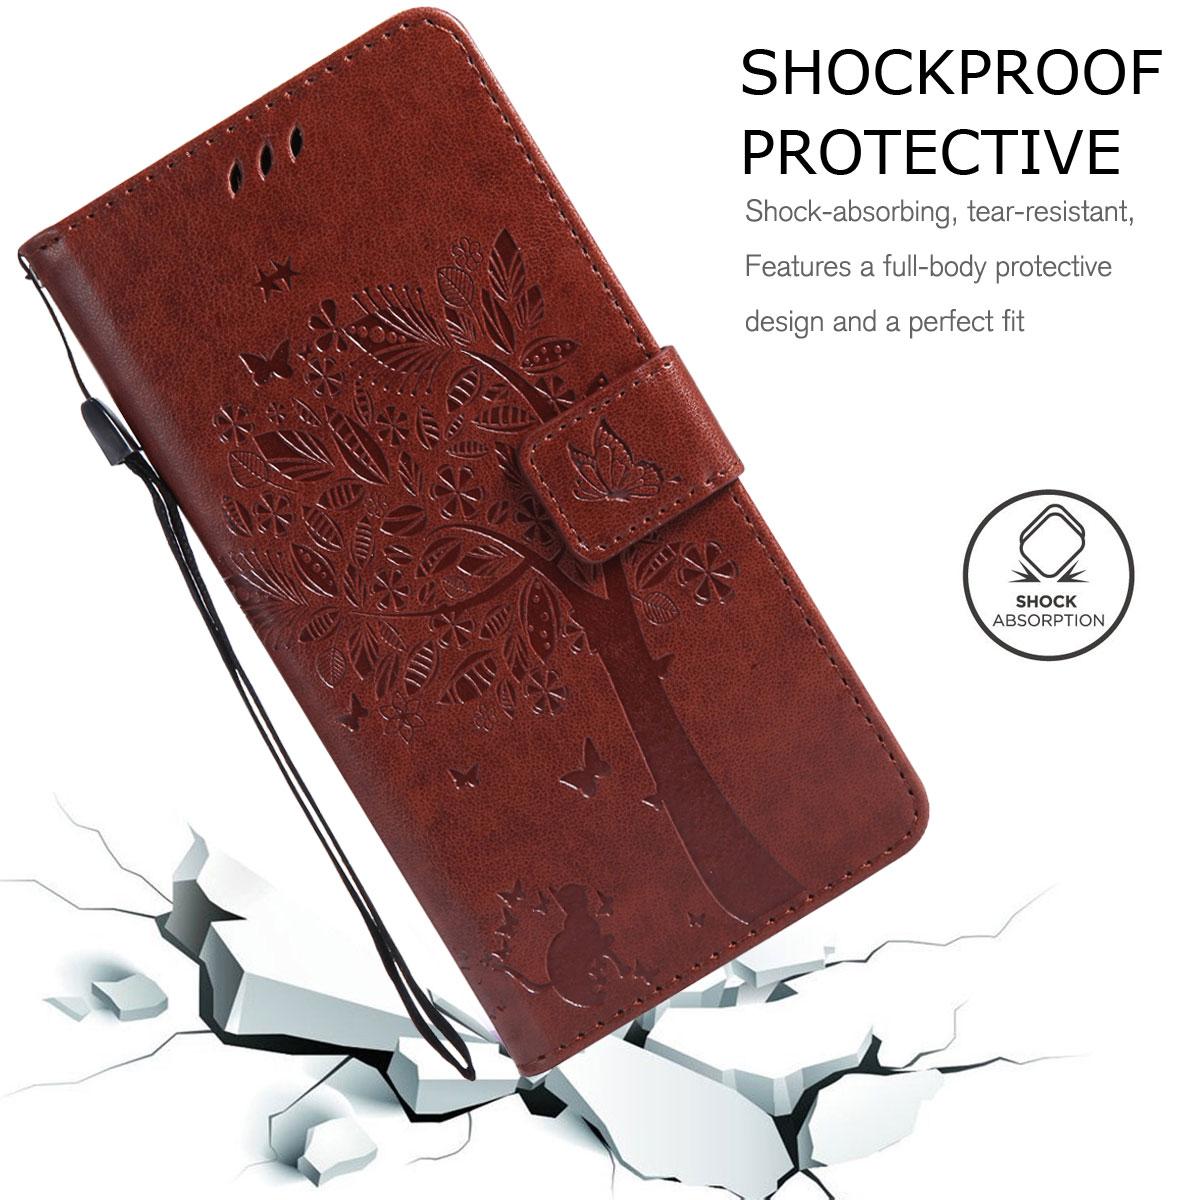 Magnetic-Leather-Credit-Card-Holder-Flip-Case-Cover-For-Google-Pixel-2-2-XL thumbnail 32